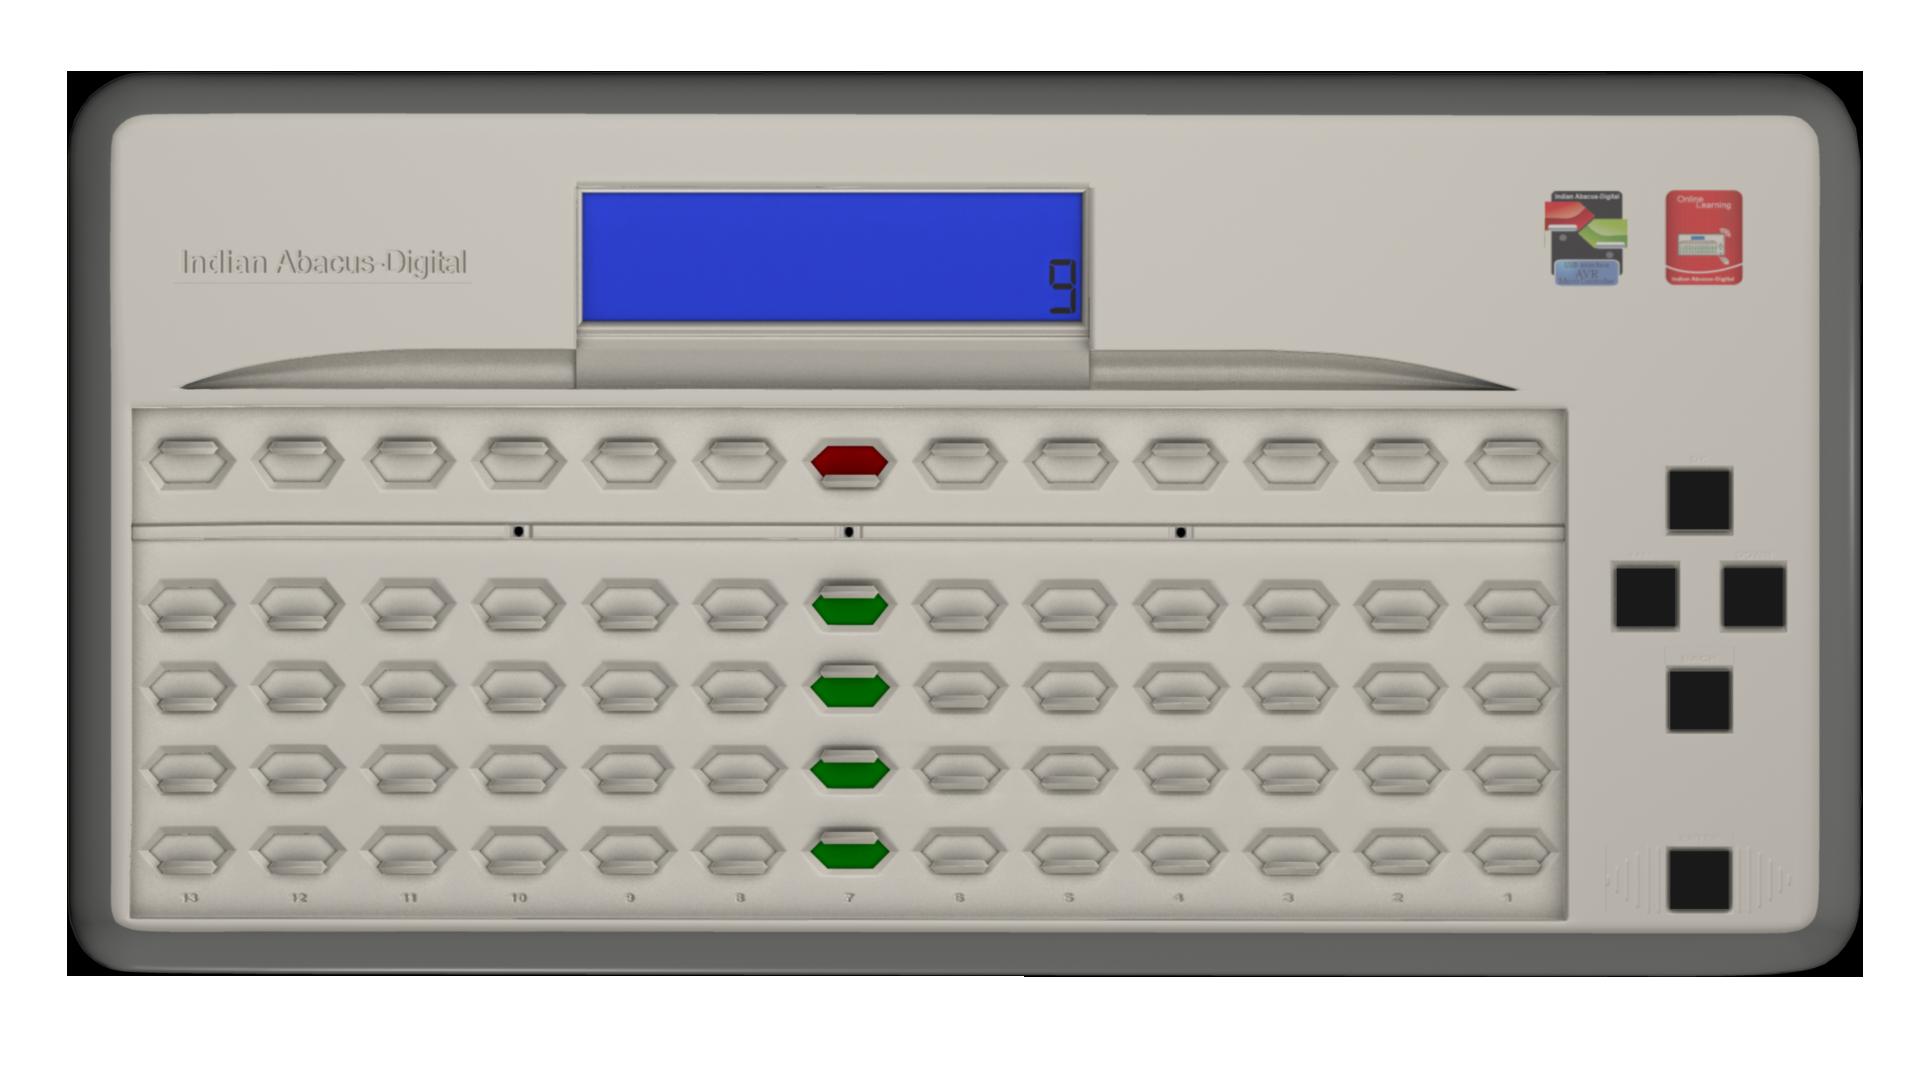 Indian Abacus Digital